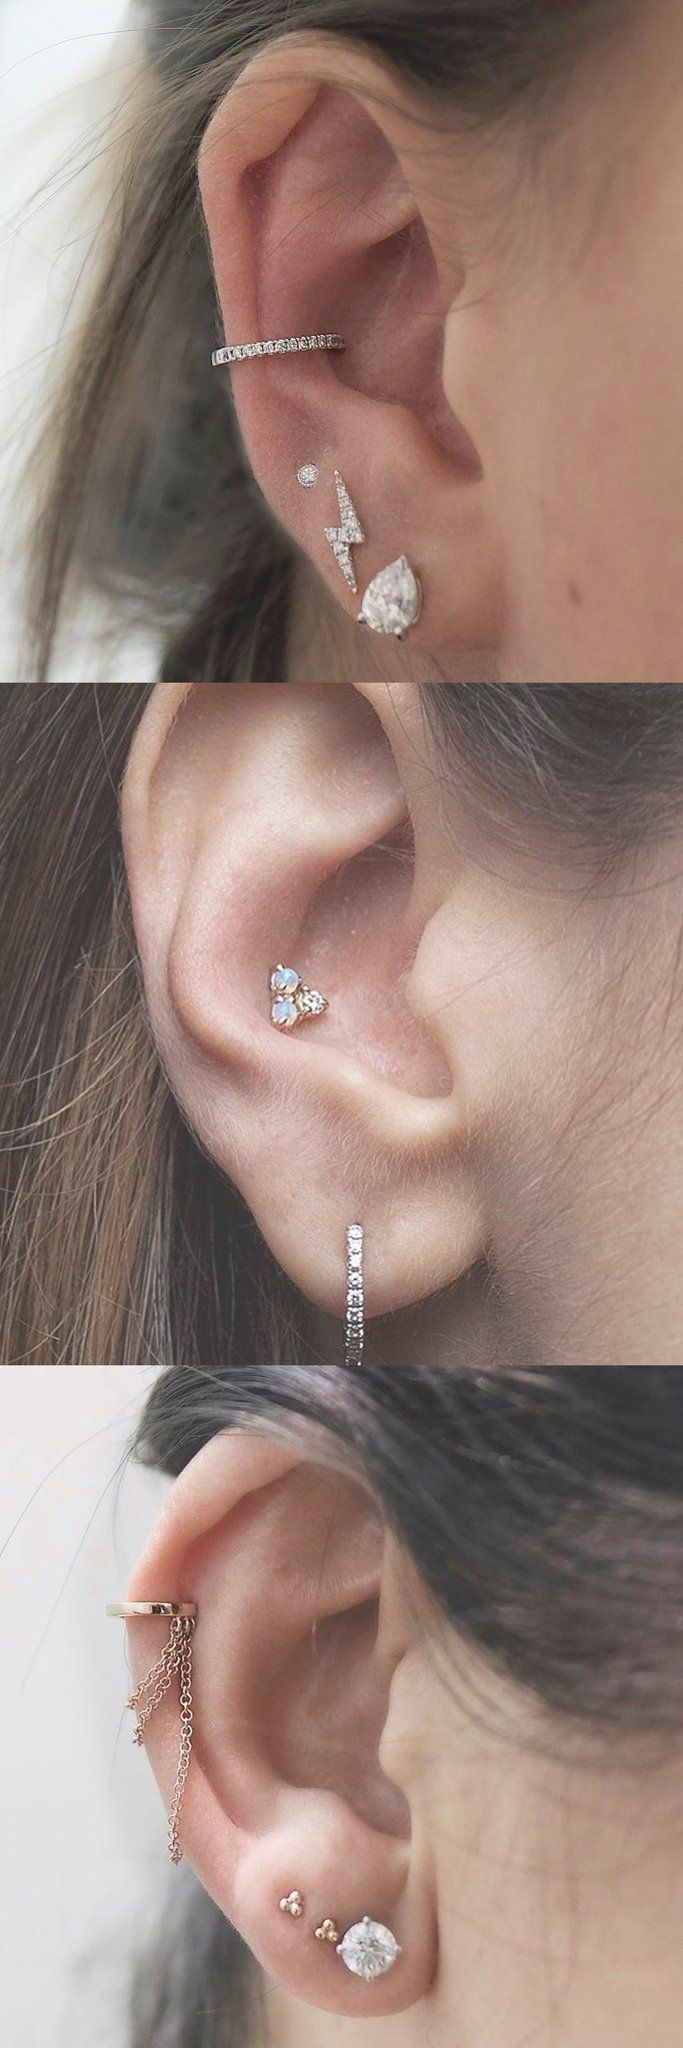 Gefällt 30.5 Tsd. Mal, 472 Kommentare - The Vampire Diaries (Hannah Abigail.dia #earpiercingideas